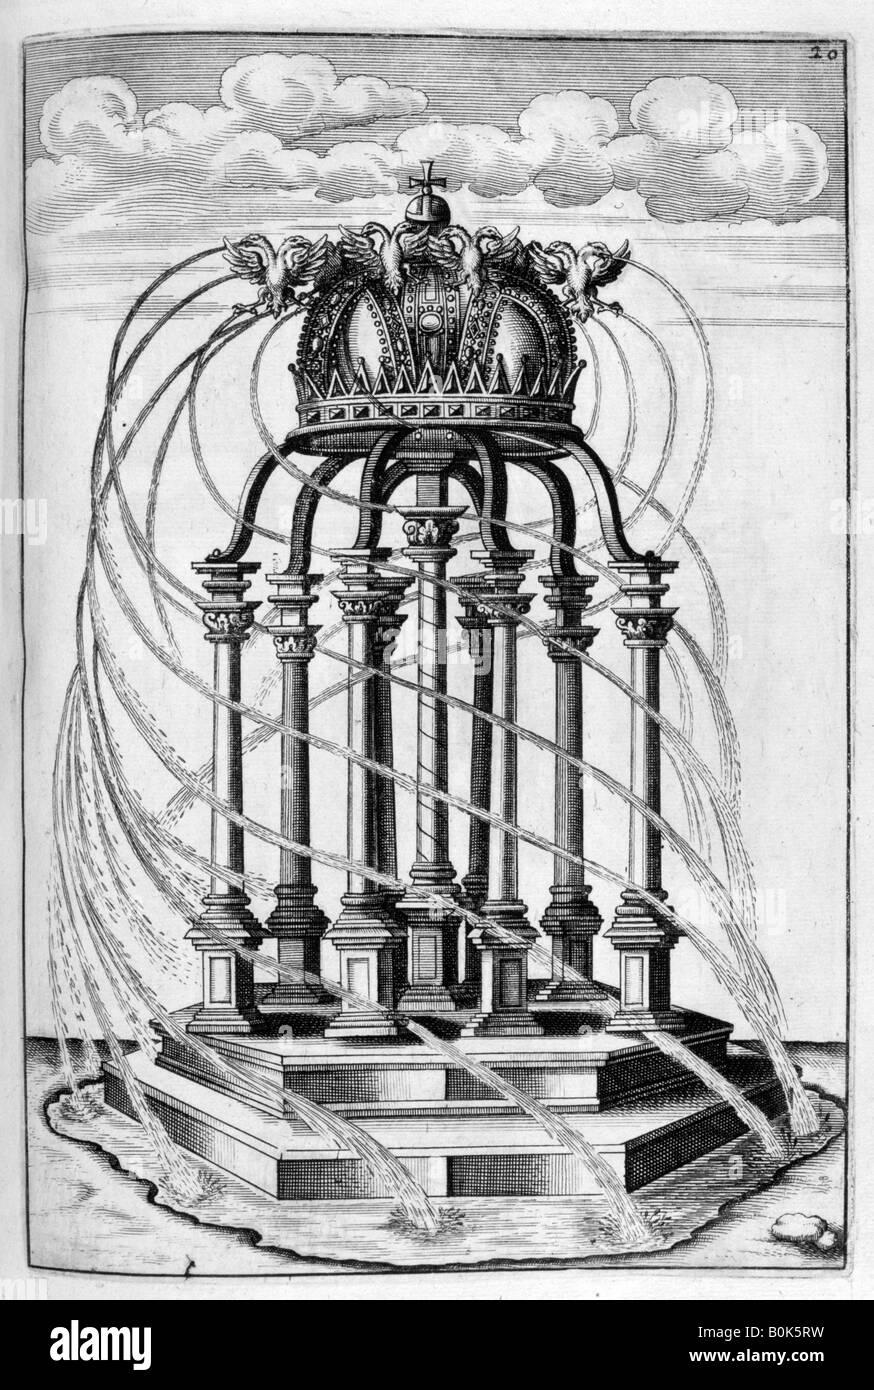 Fountain design, 1664. Artist: Georg Andreas Bockler - Stock Image